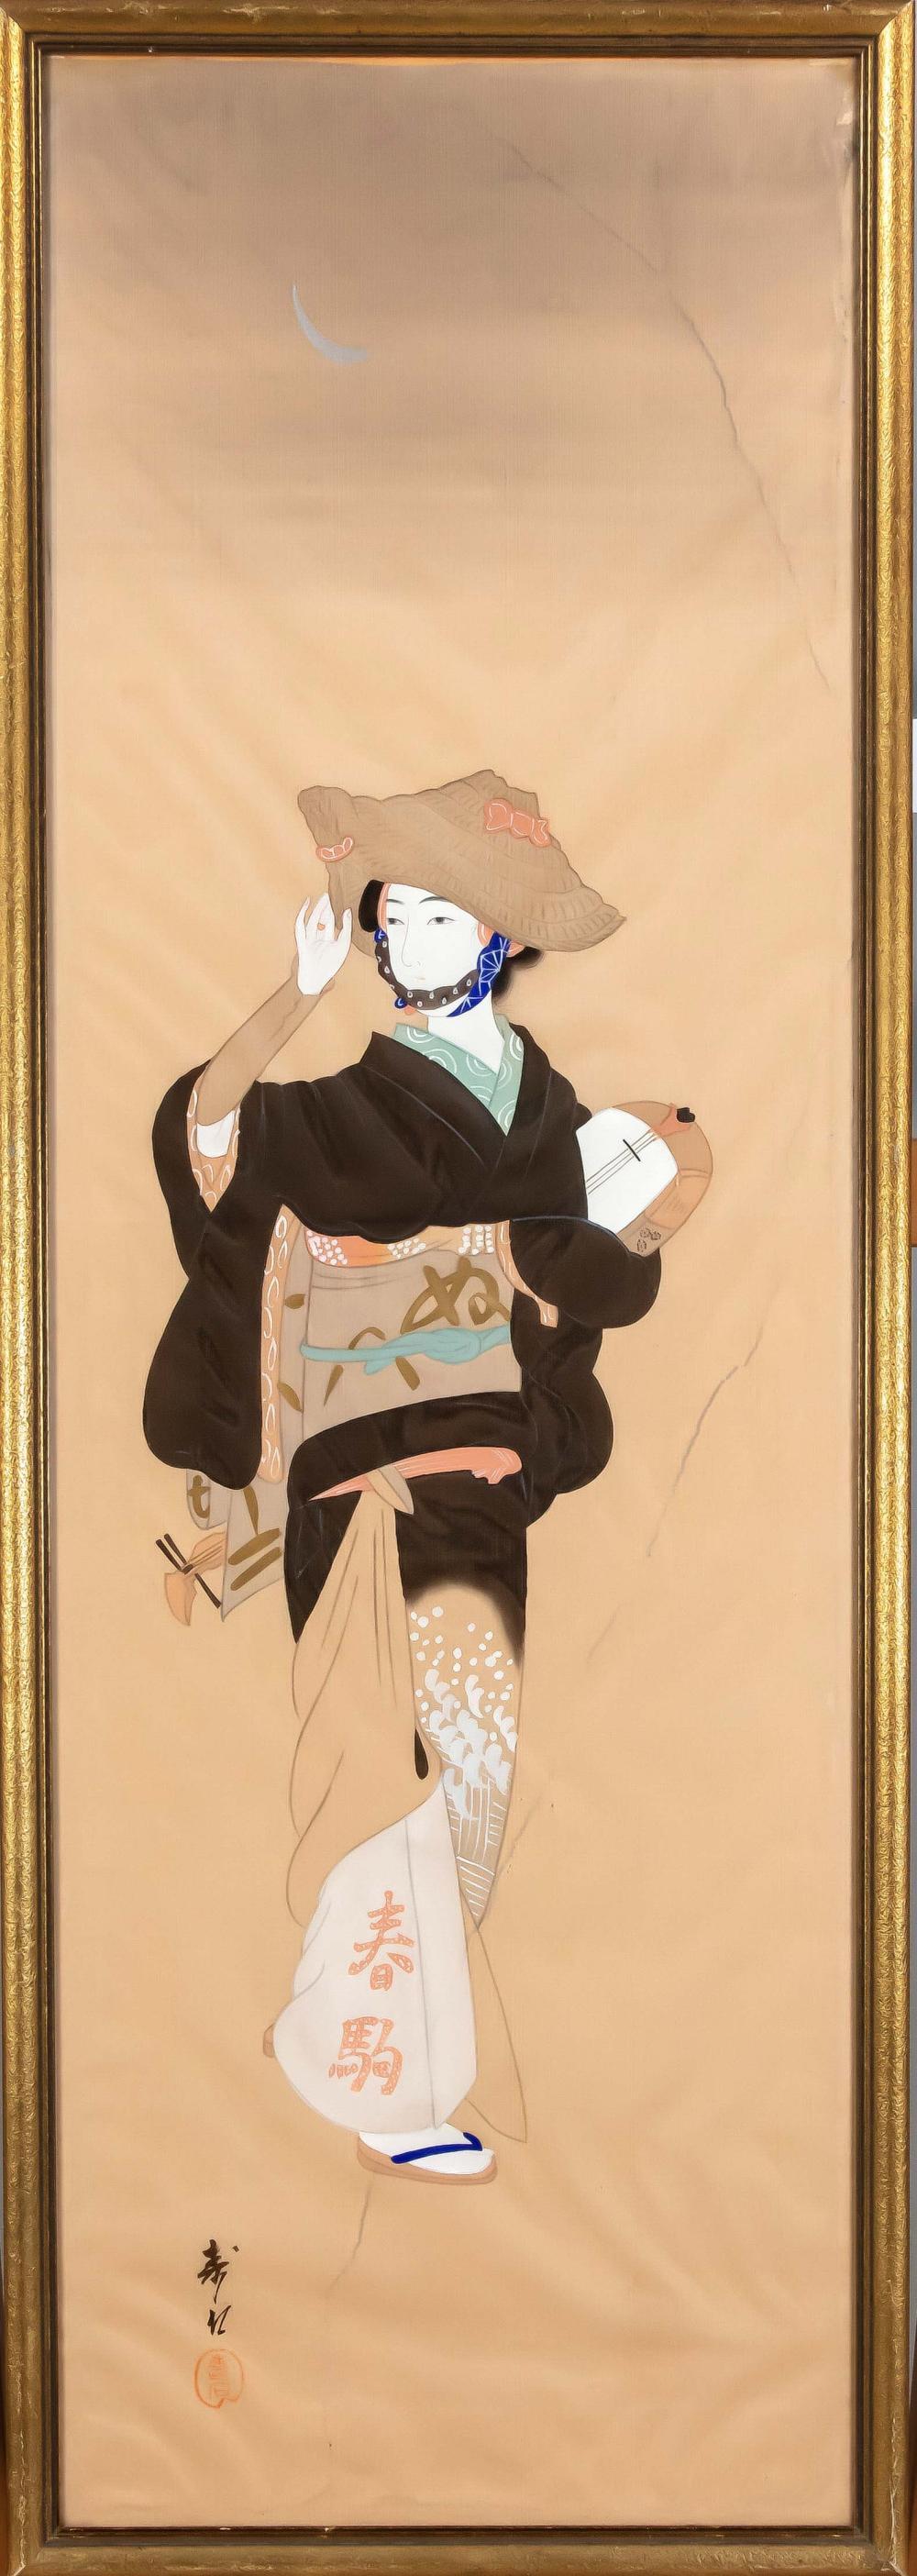 Silk painting, Japan, 20th cen